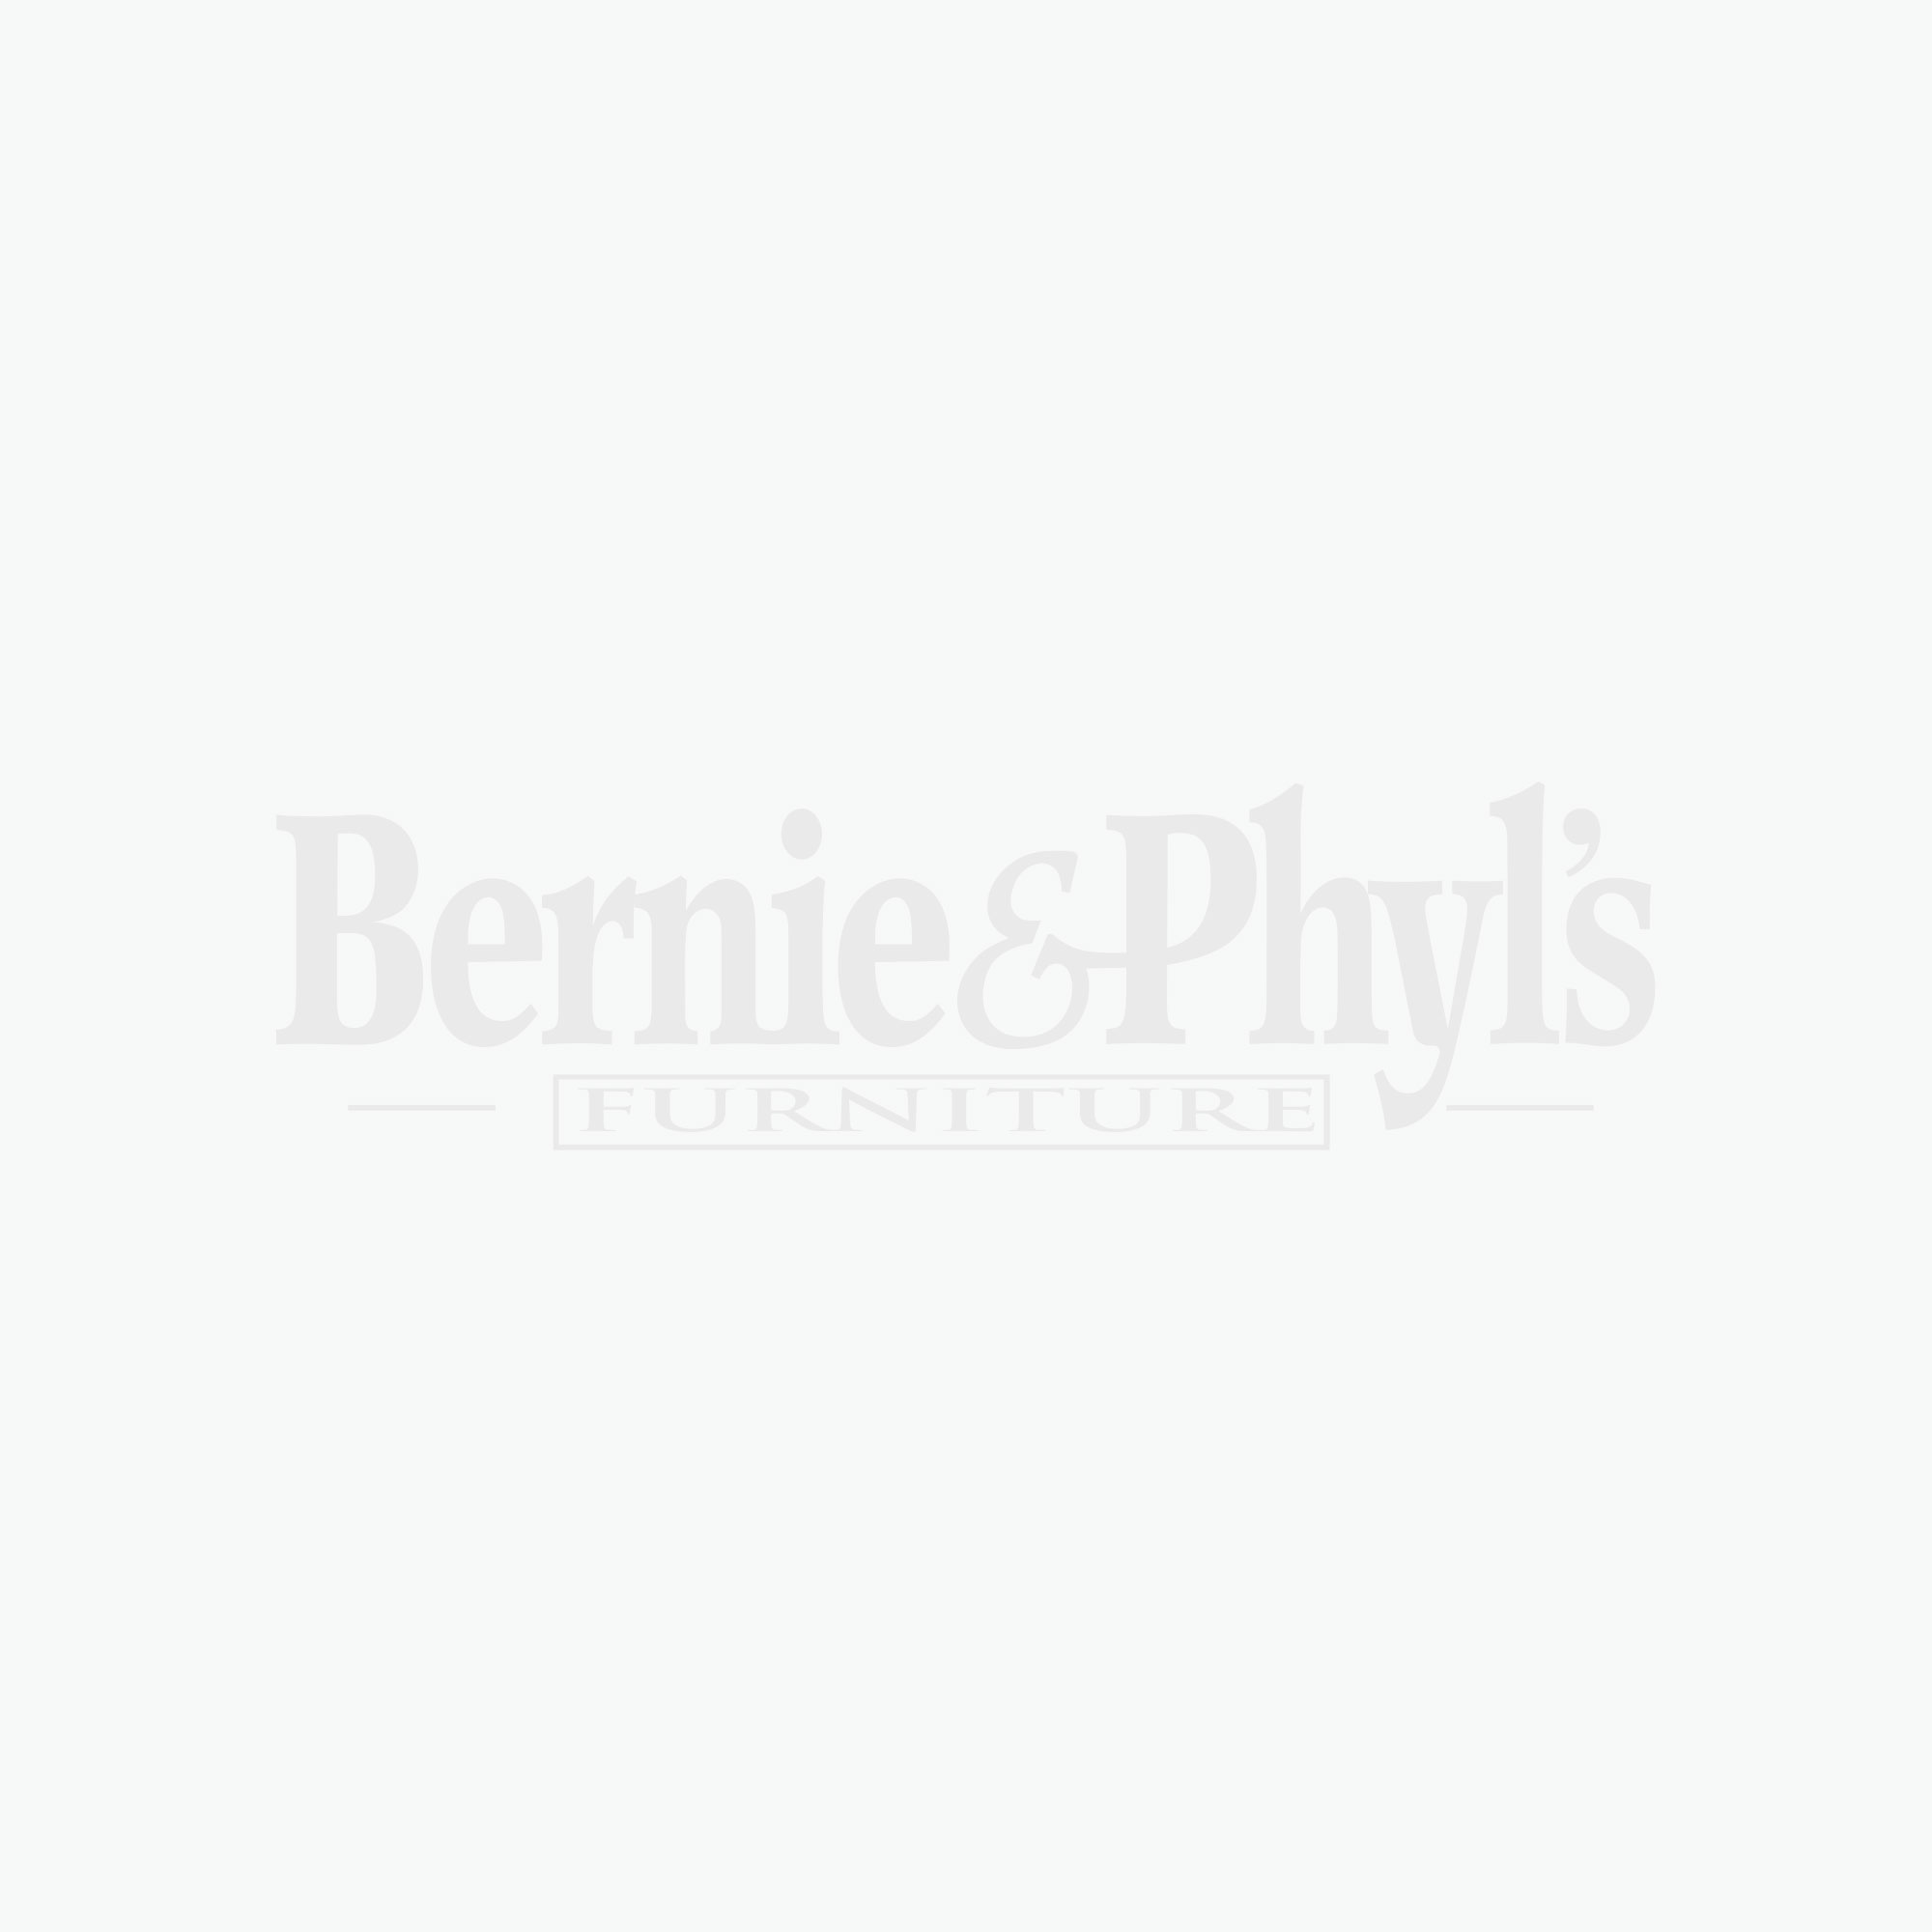 Barnburner 4 Merlot Dresser - Bernie u0026 Phylu2019s Furniture ...